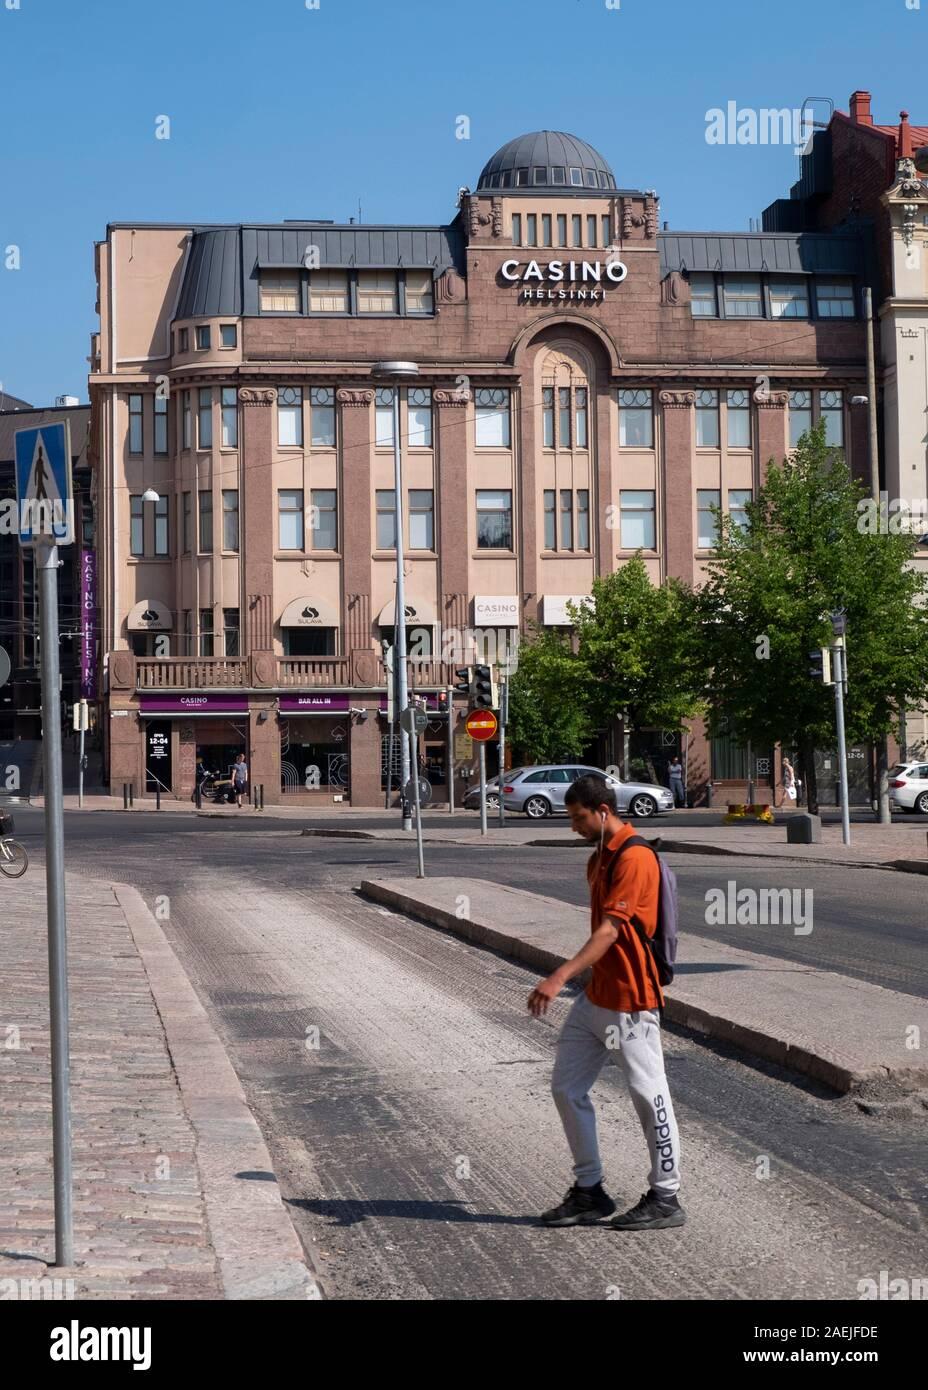 street road casino